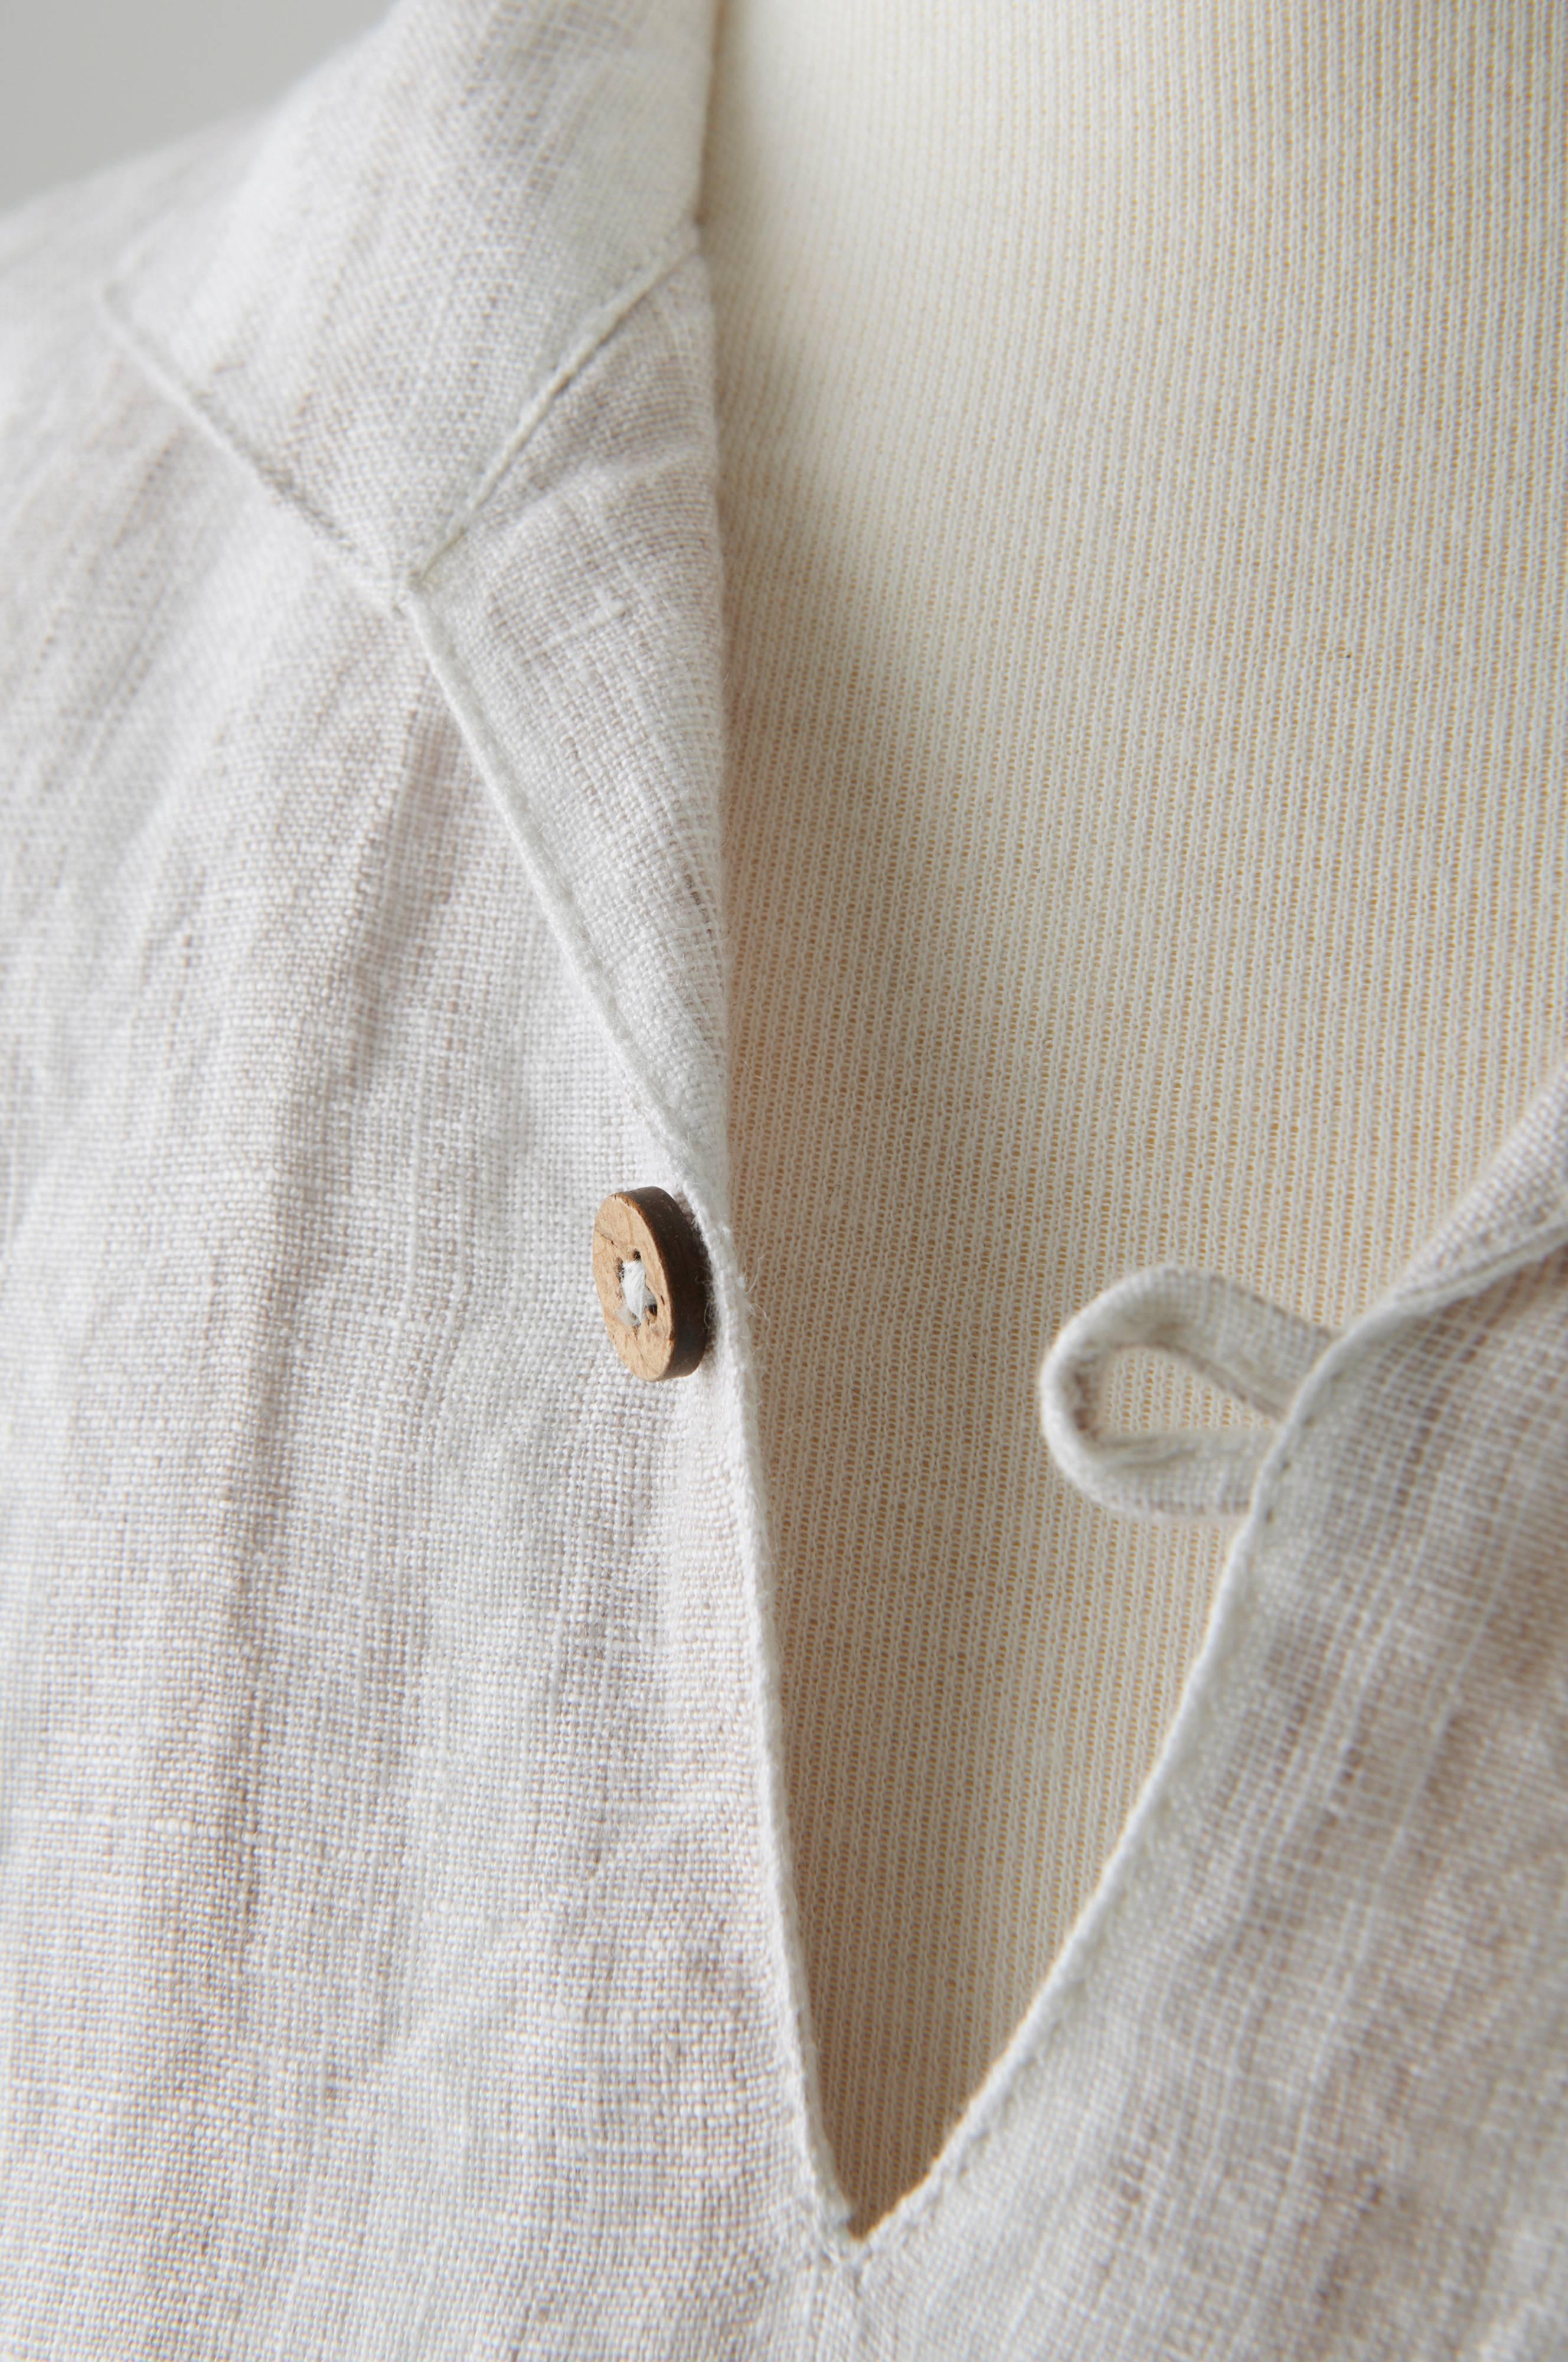 DELINA linskjorte herre Hvit Baderomstekstiler Jotex